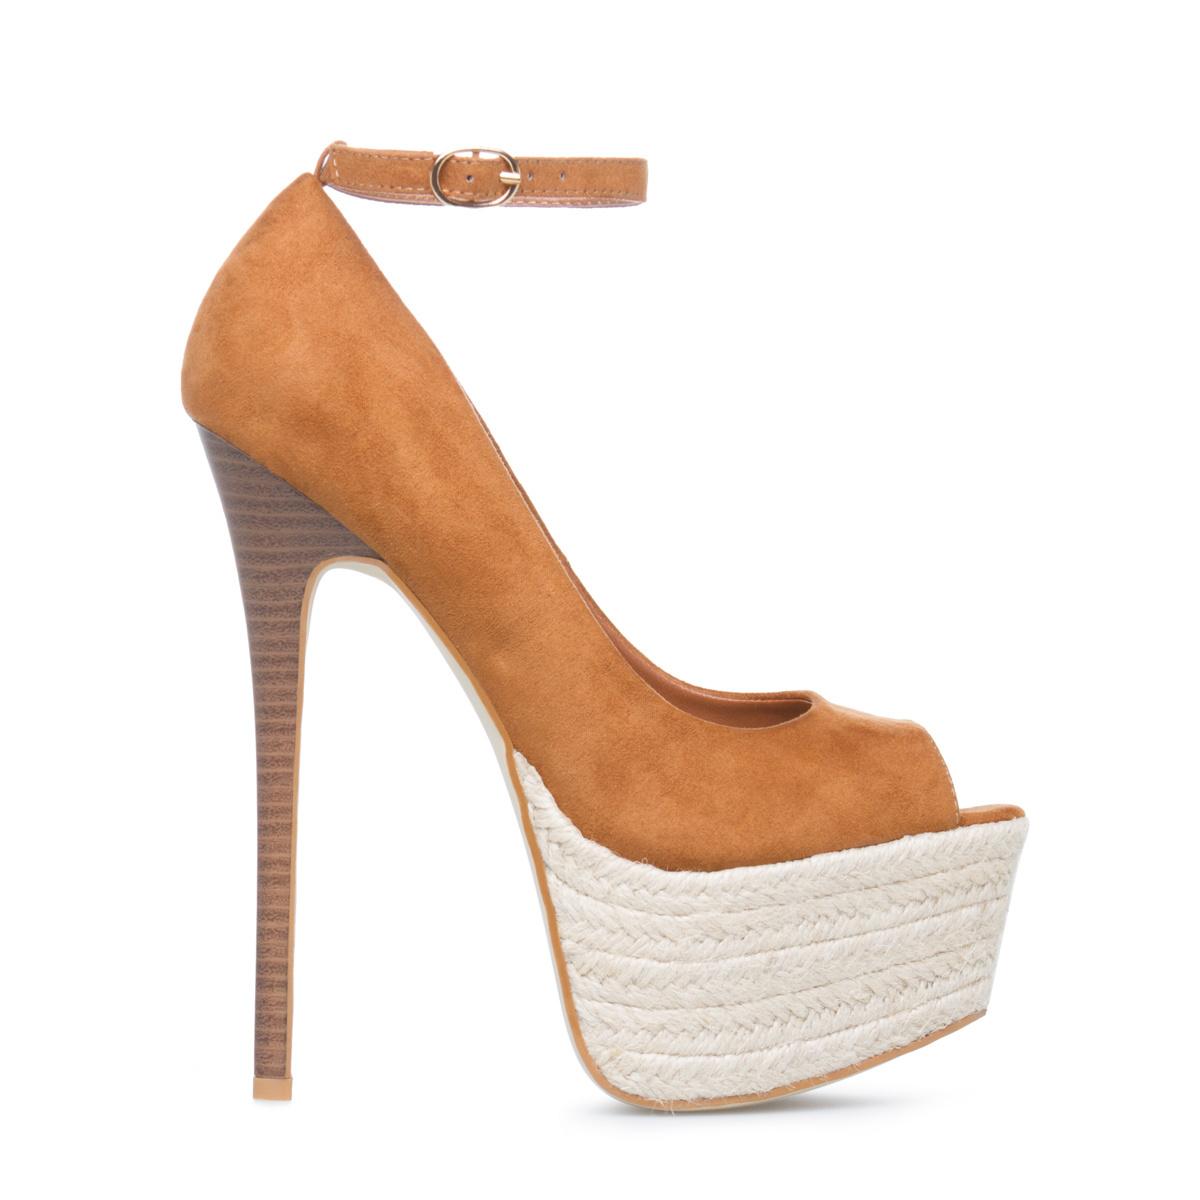 Platform Pumps, Women's Discount Shoes, Peep Toe Pumps, High Heels ...